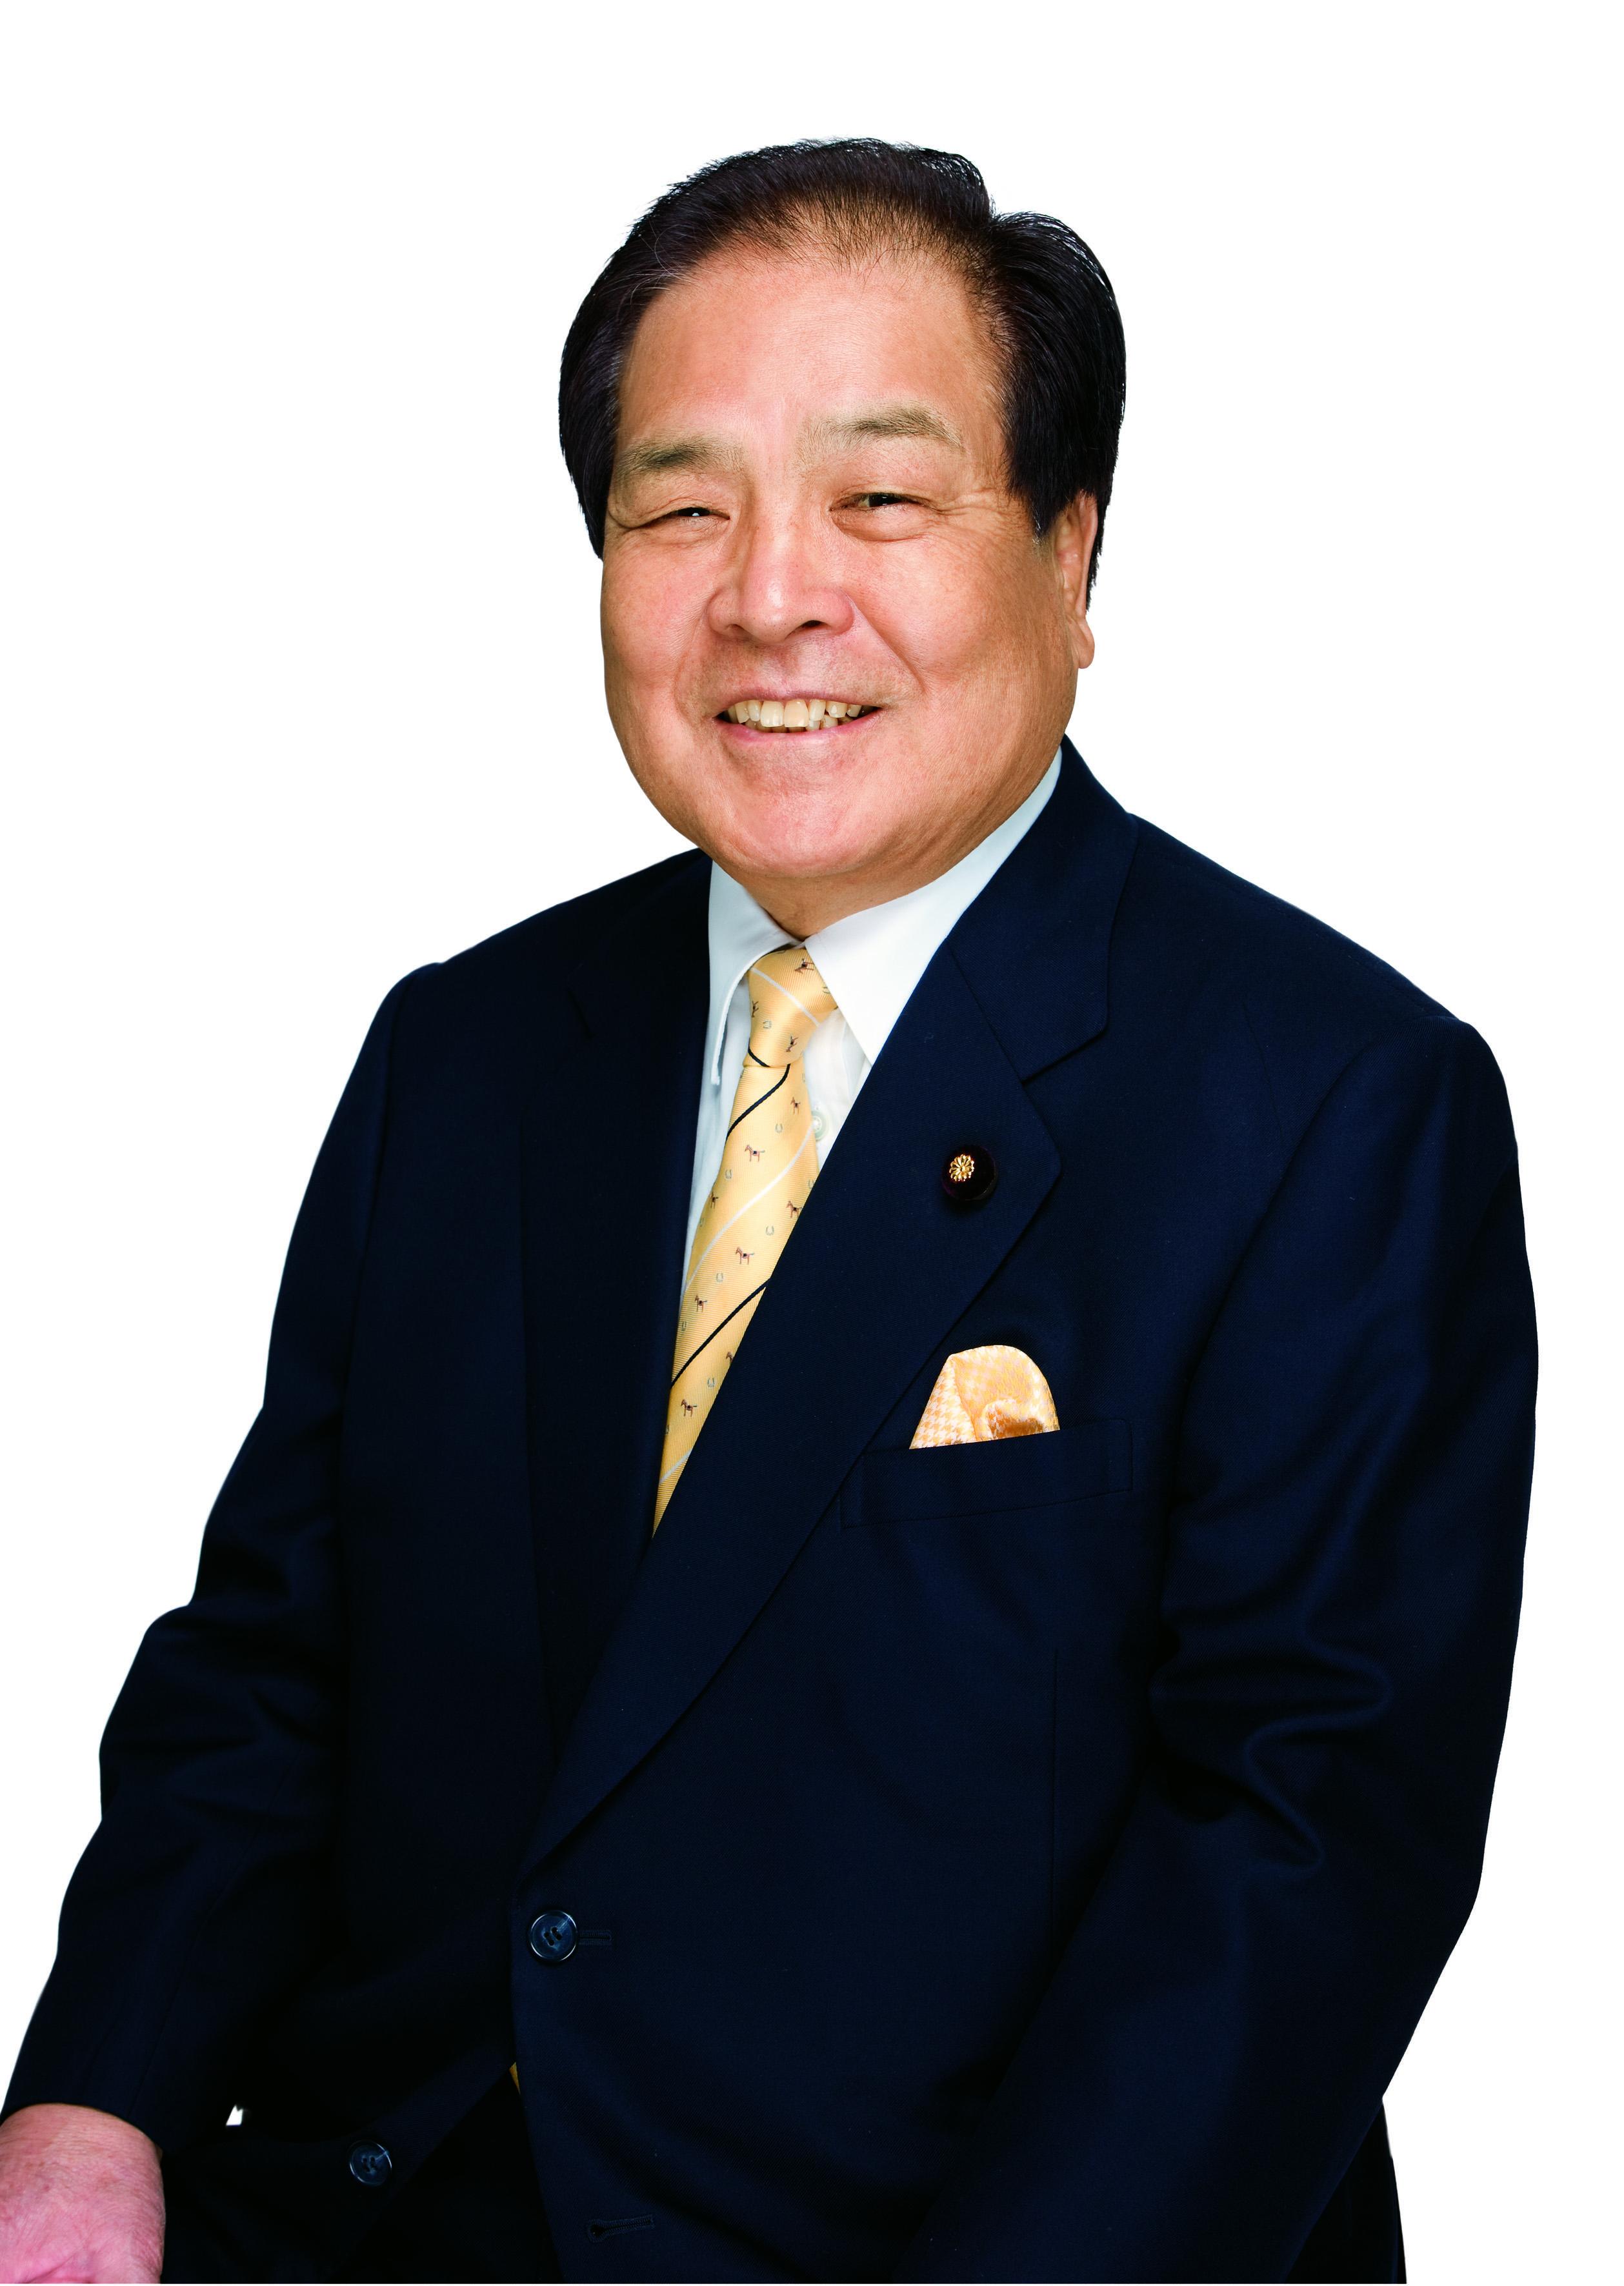 NHK「日曜討論」片山虎之助共同代表出演のお知らせ